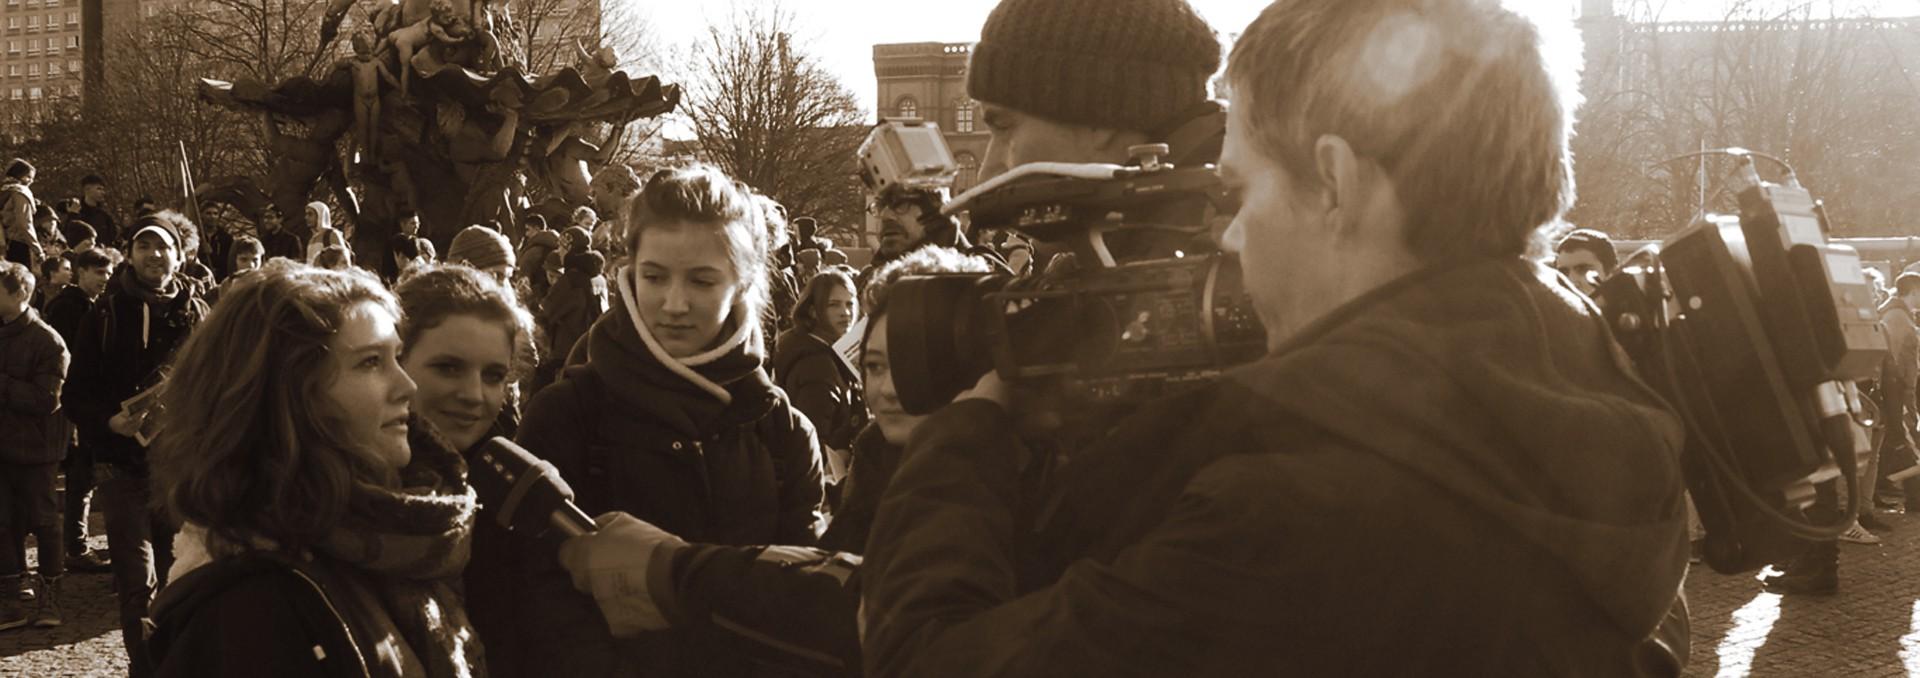 Kiezgeflüster Schülerdemo für Flüchtlinge, redaktion, eb teams, eng teams, backfocus, India, Asia, Indien, film ploeg, redactie, bbs